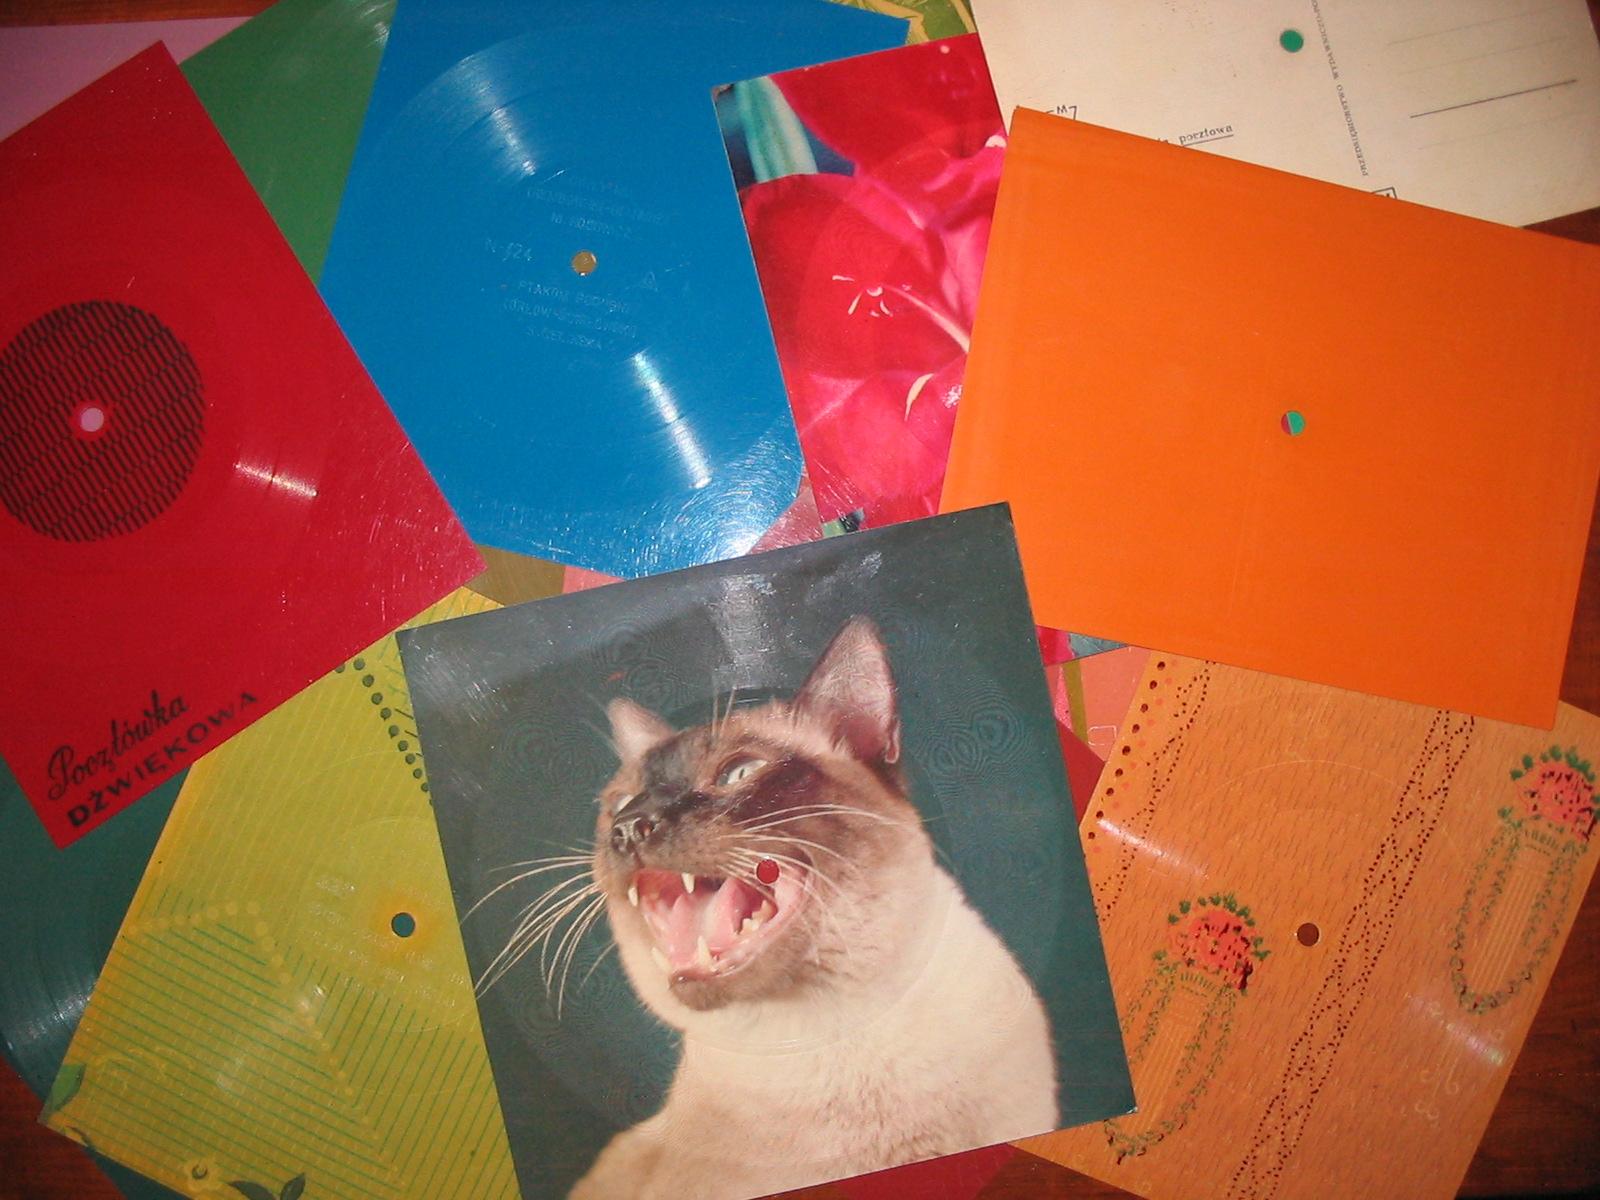 DEPECHE MODE VARIOUS TITLES MINIATURE 1//12 Non Playable VINYL RECORD ALBUMS